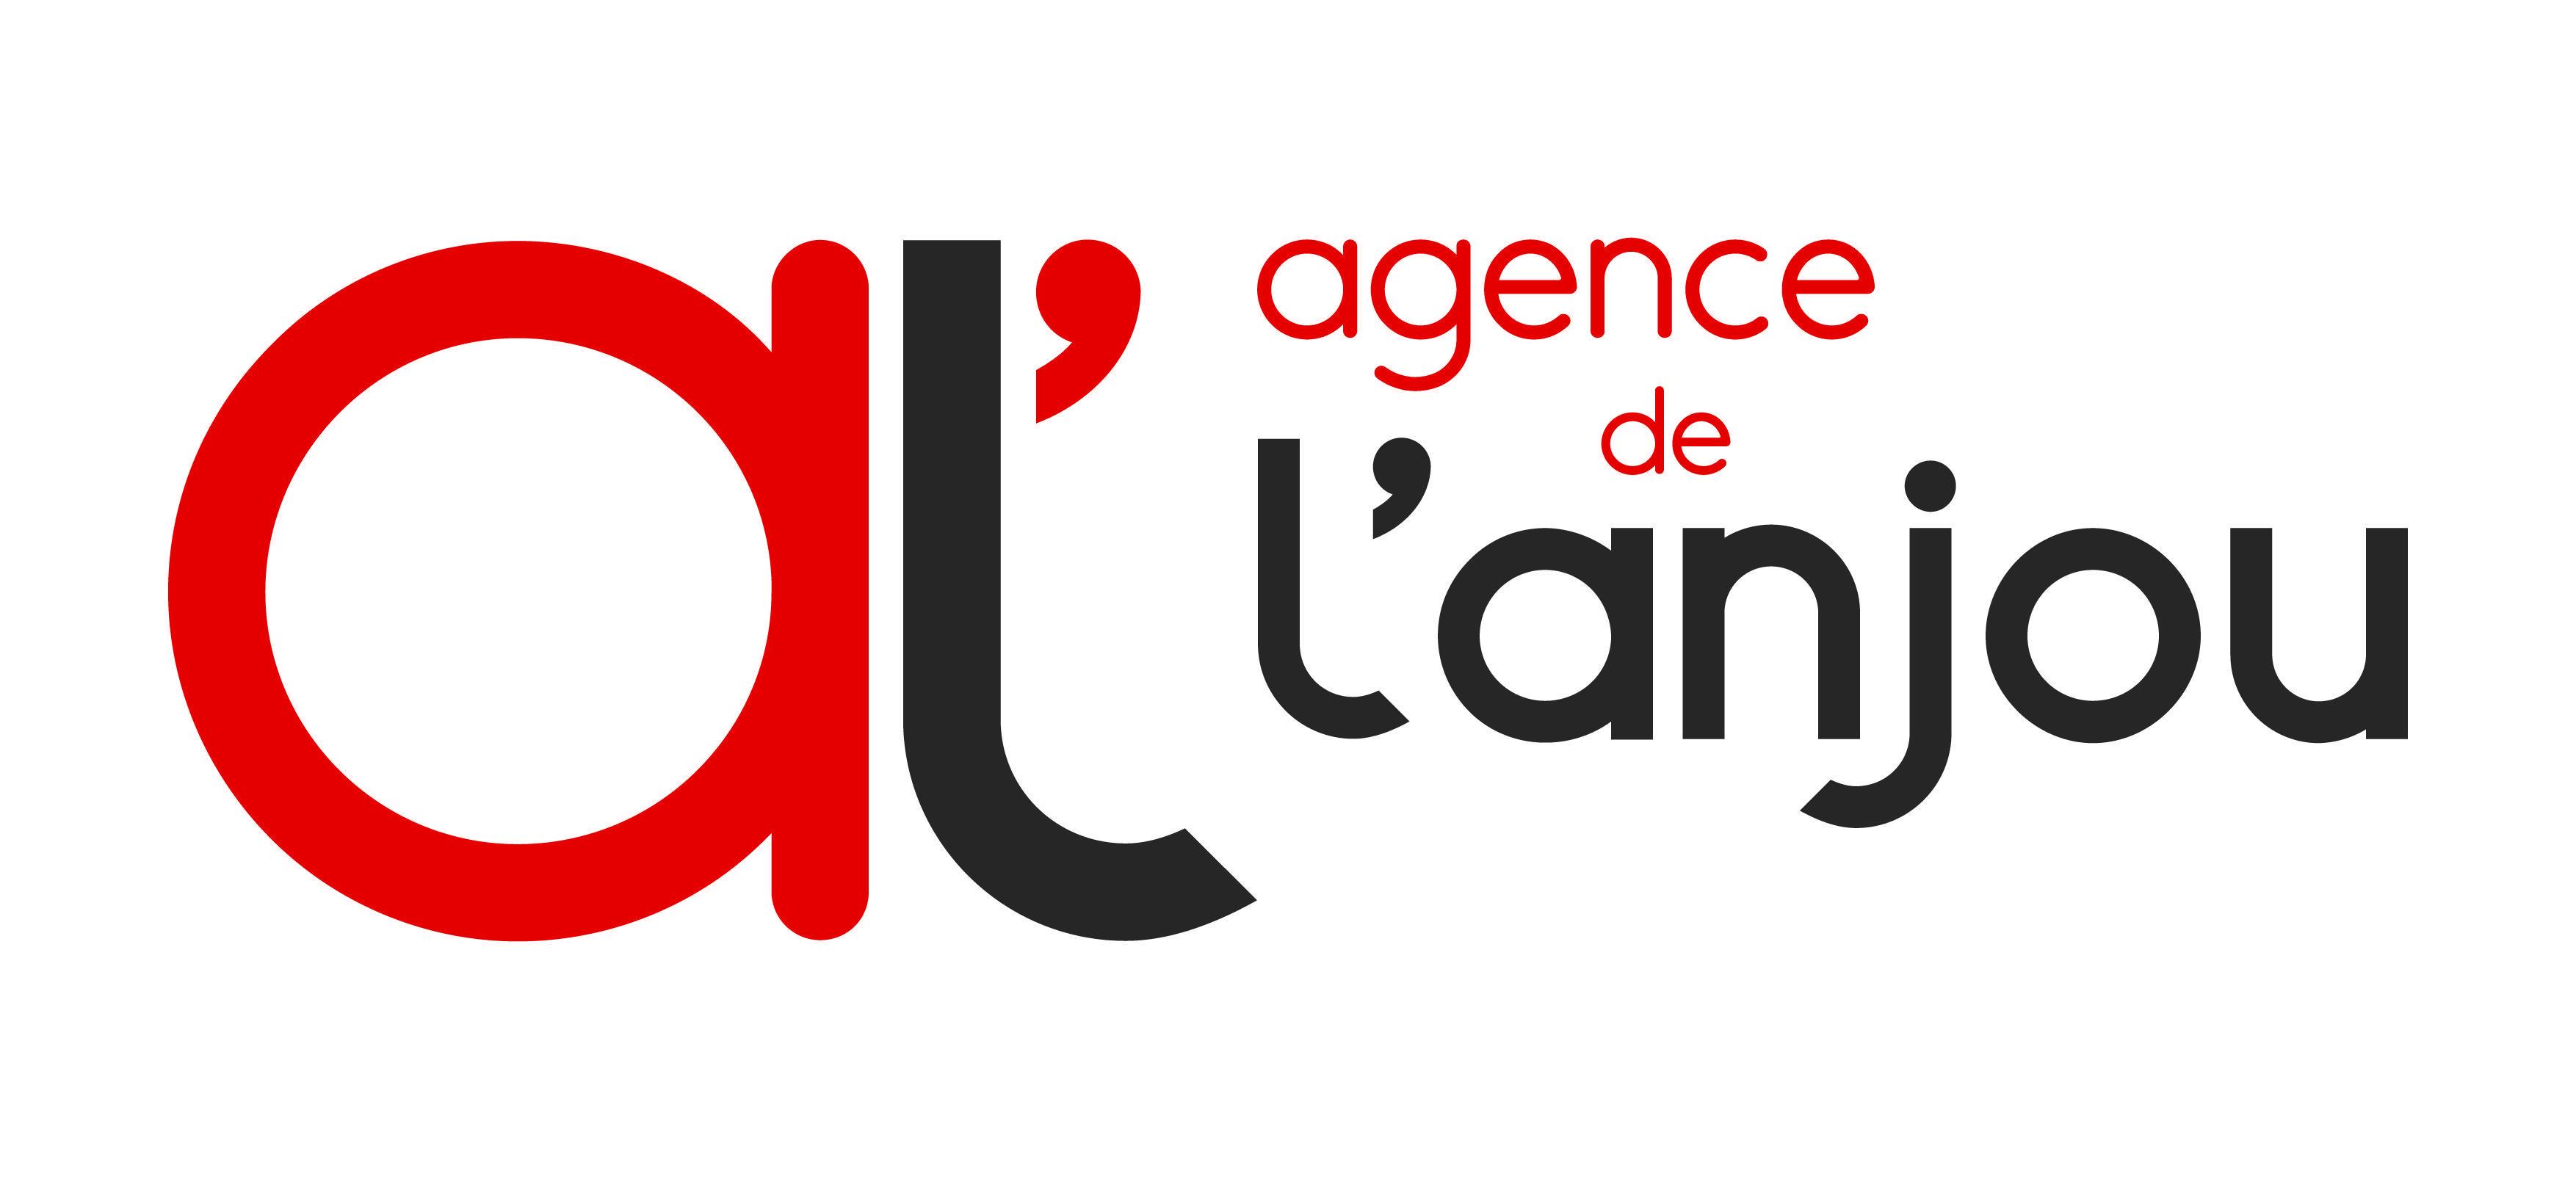 Agence de l'Anjou agence immobilière Angers (49100)